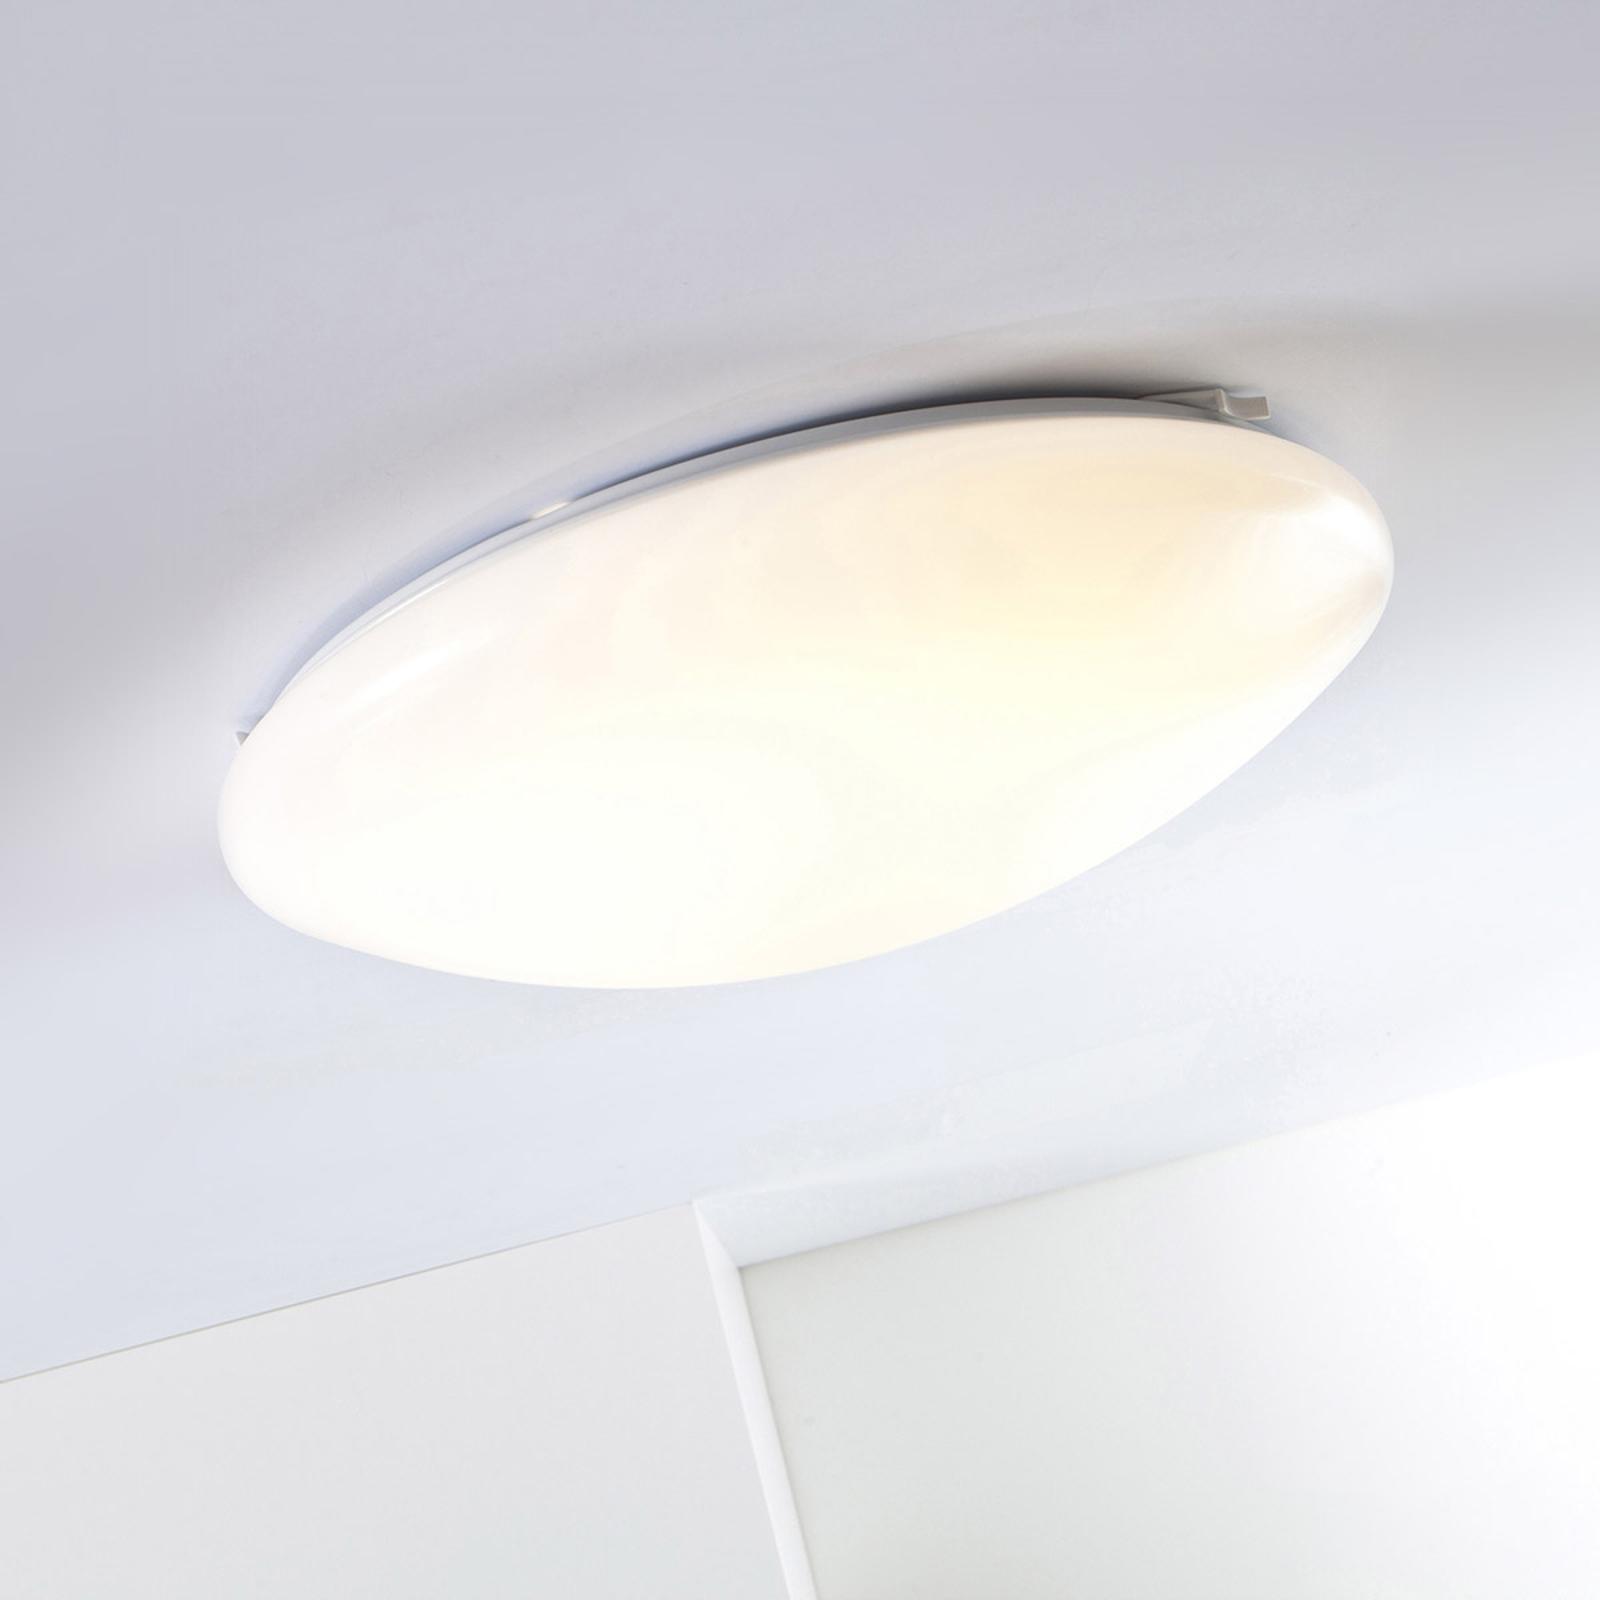 Plafoniera tonda LED Basic di AEG, 14 W